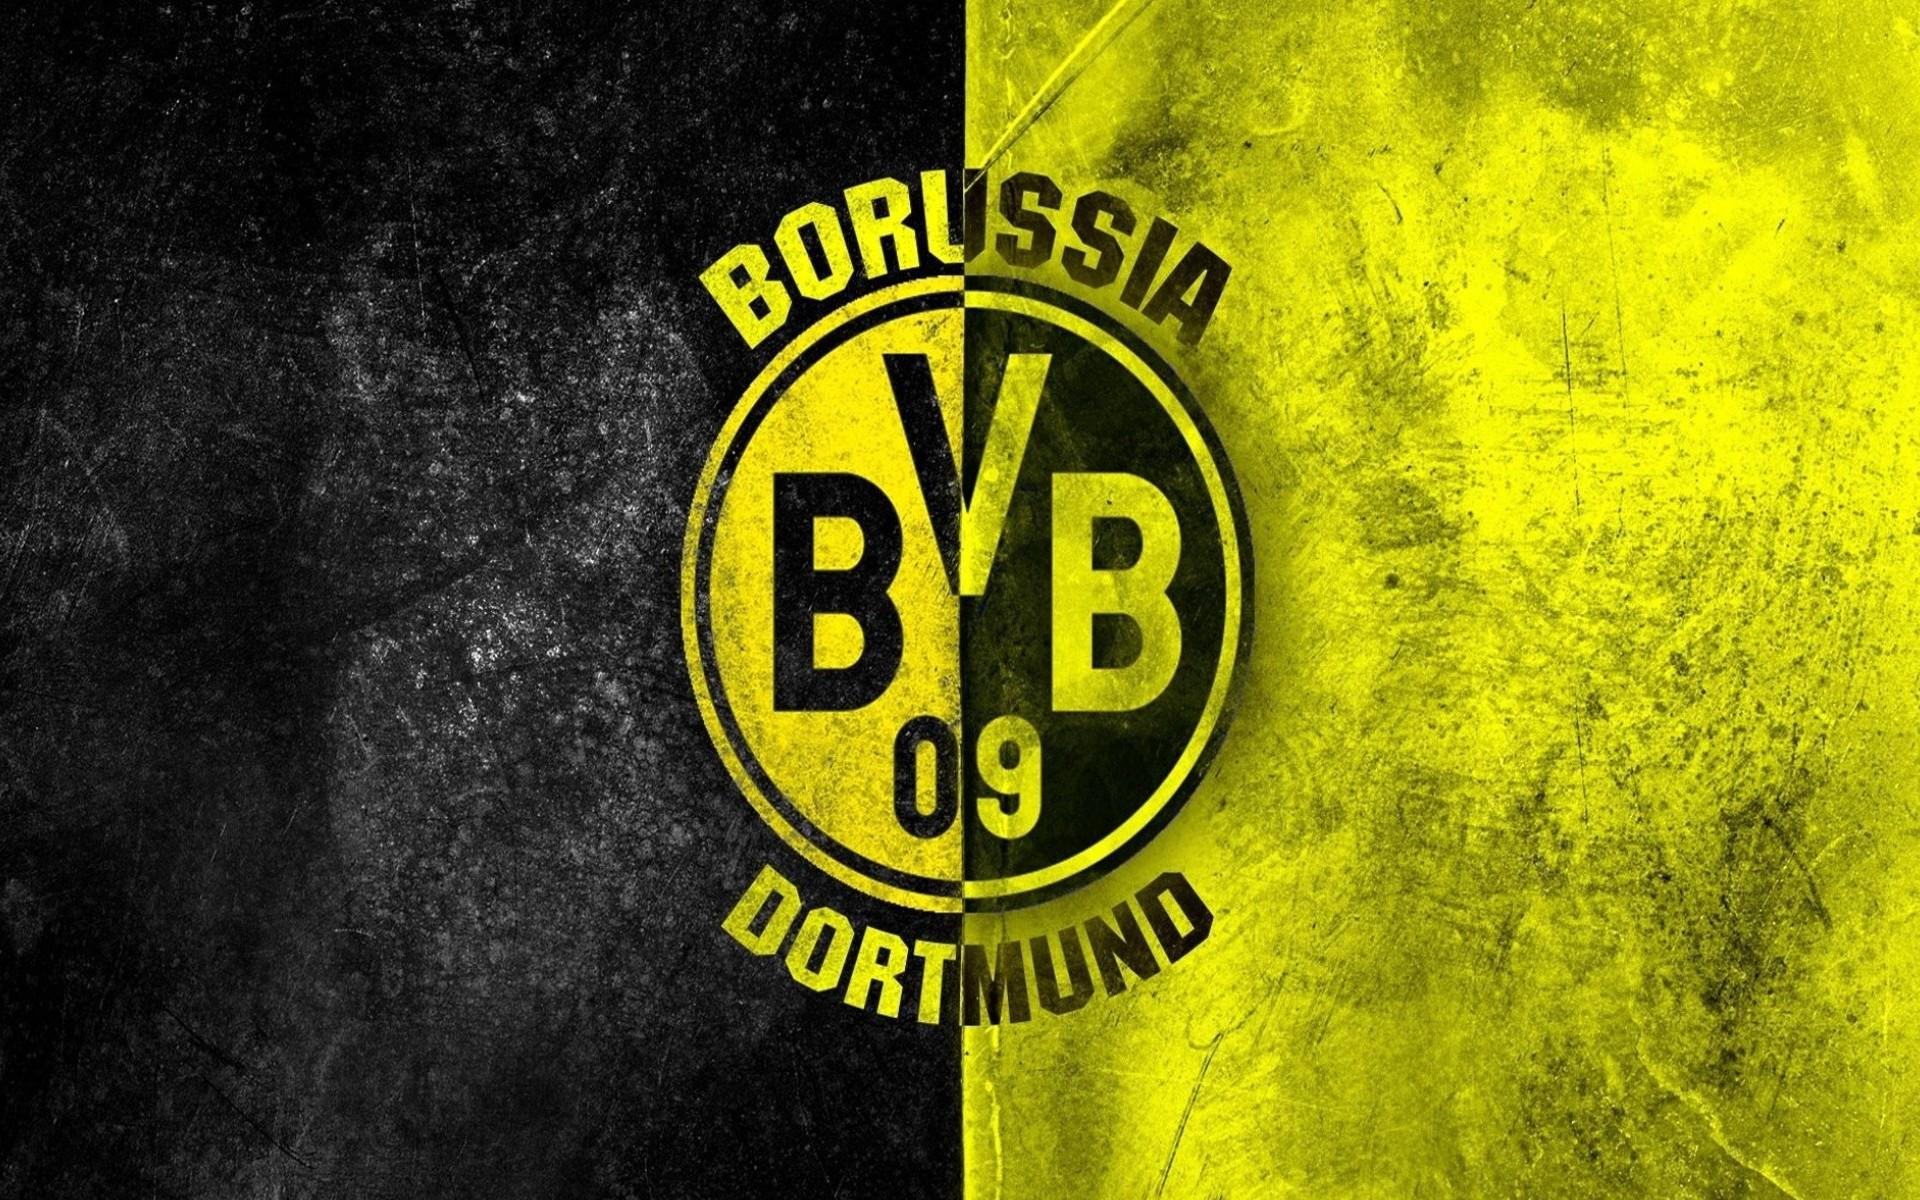 Borussia Dortmund HD Wallpaper Background Image 1920x1200 ID 1920x1200